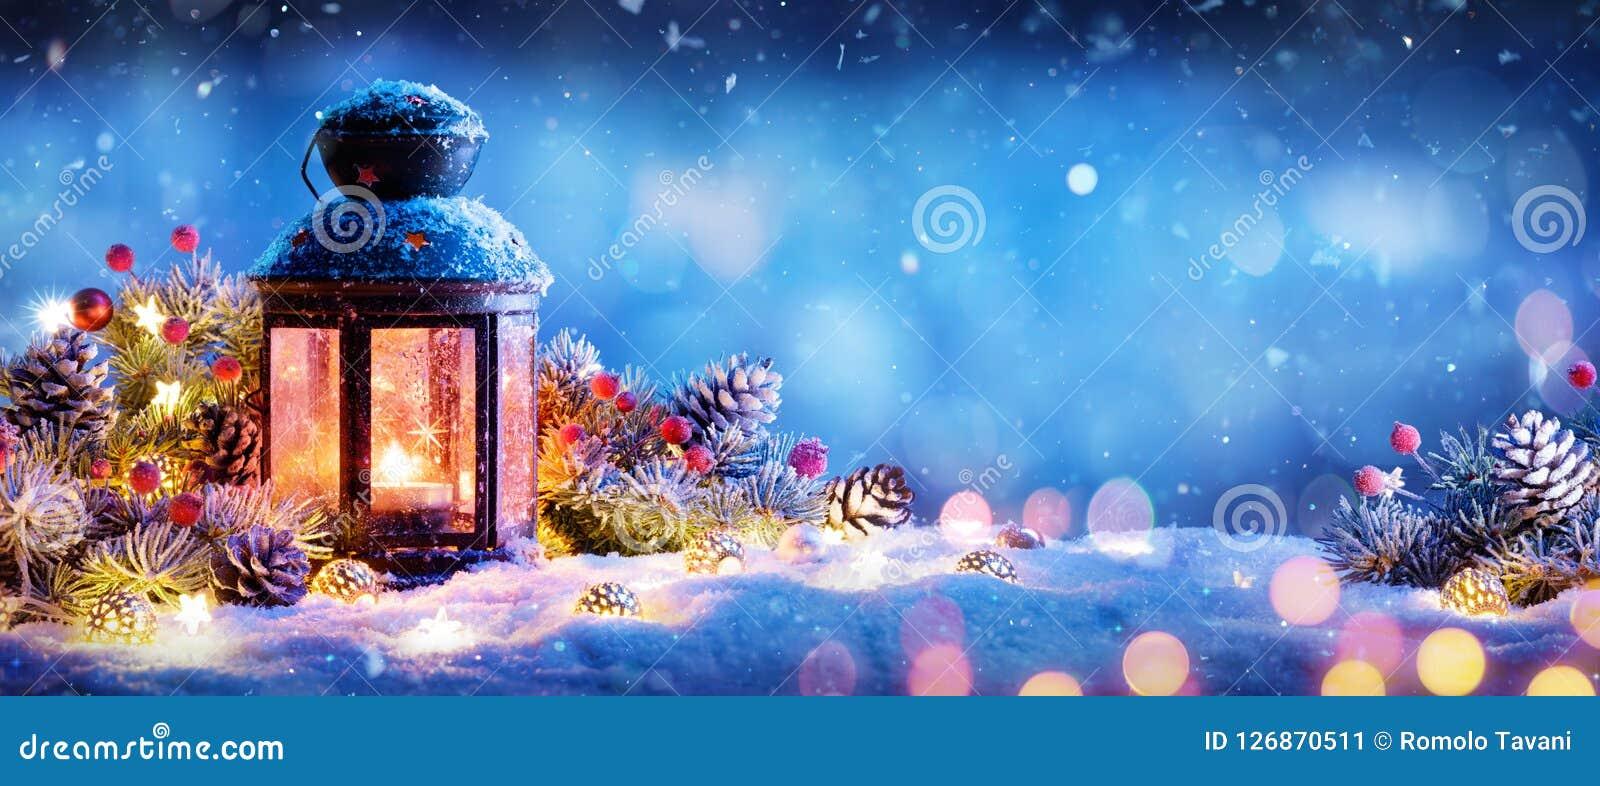 Christmas Decoration - Lantern With Ornament